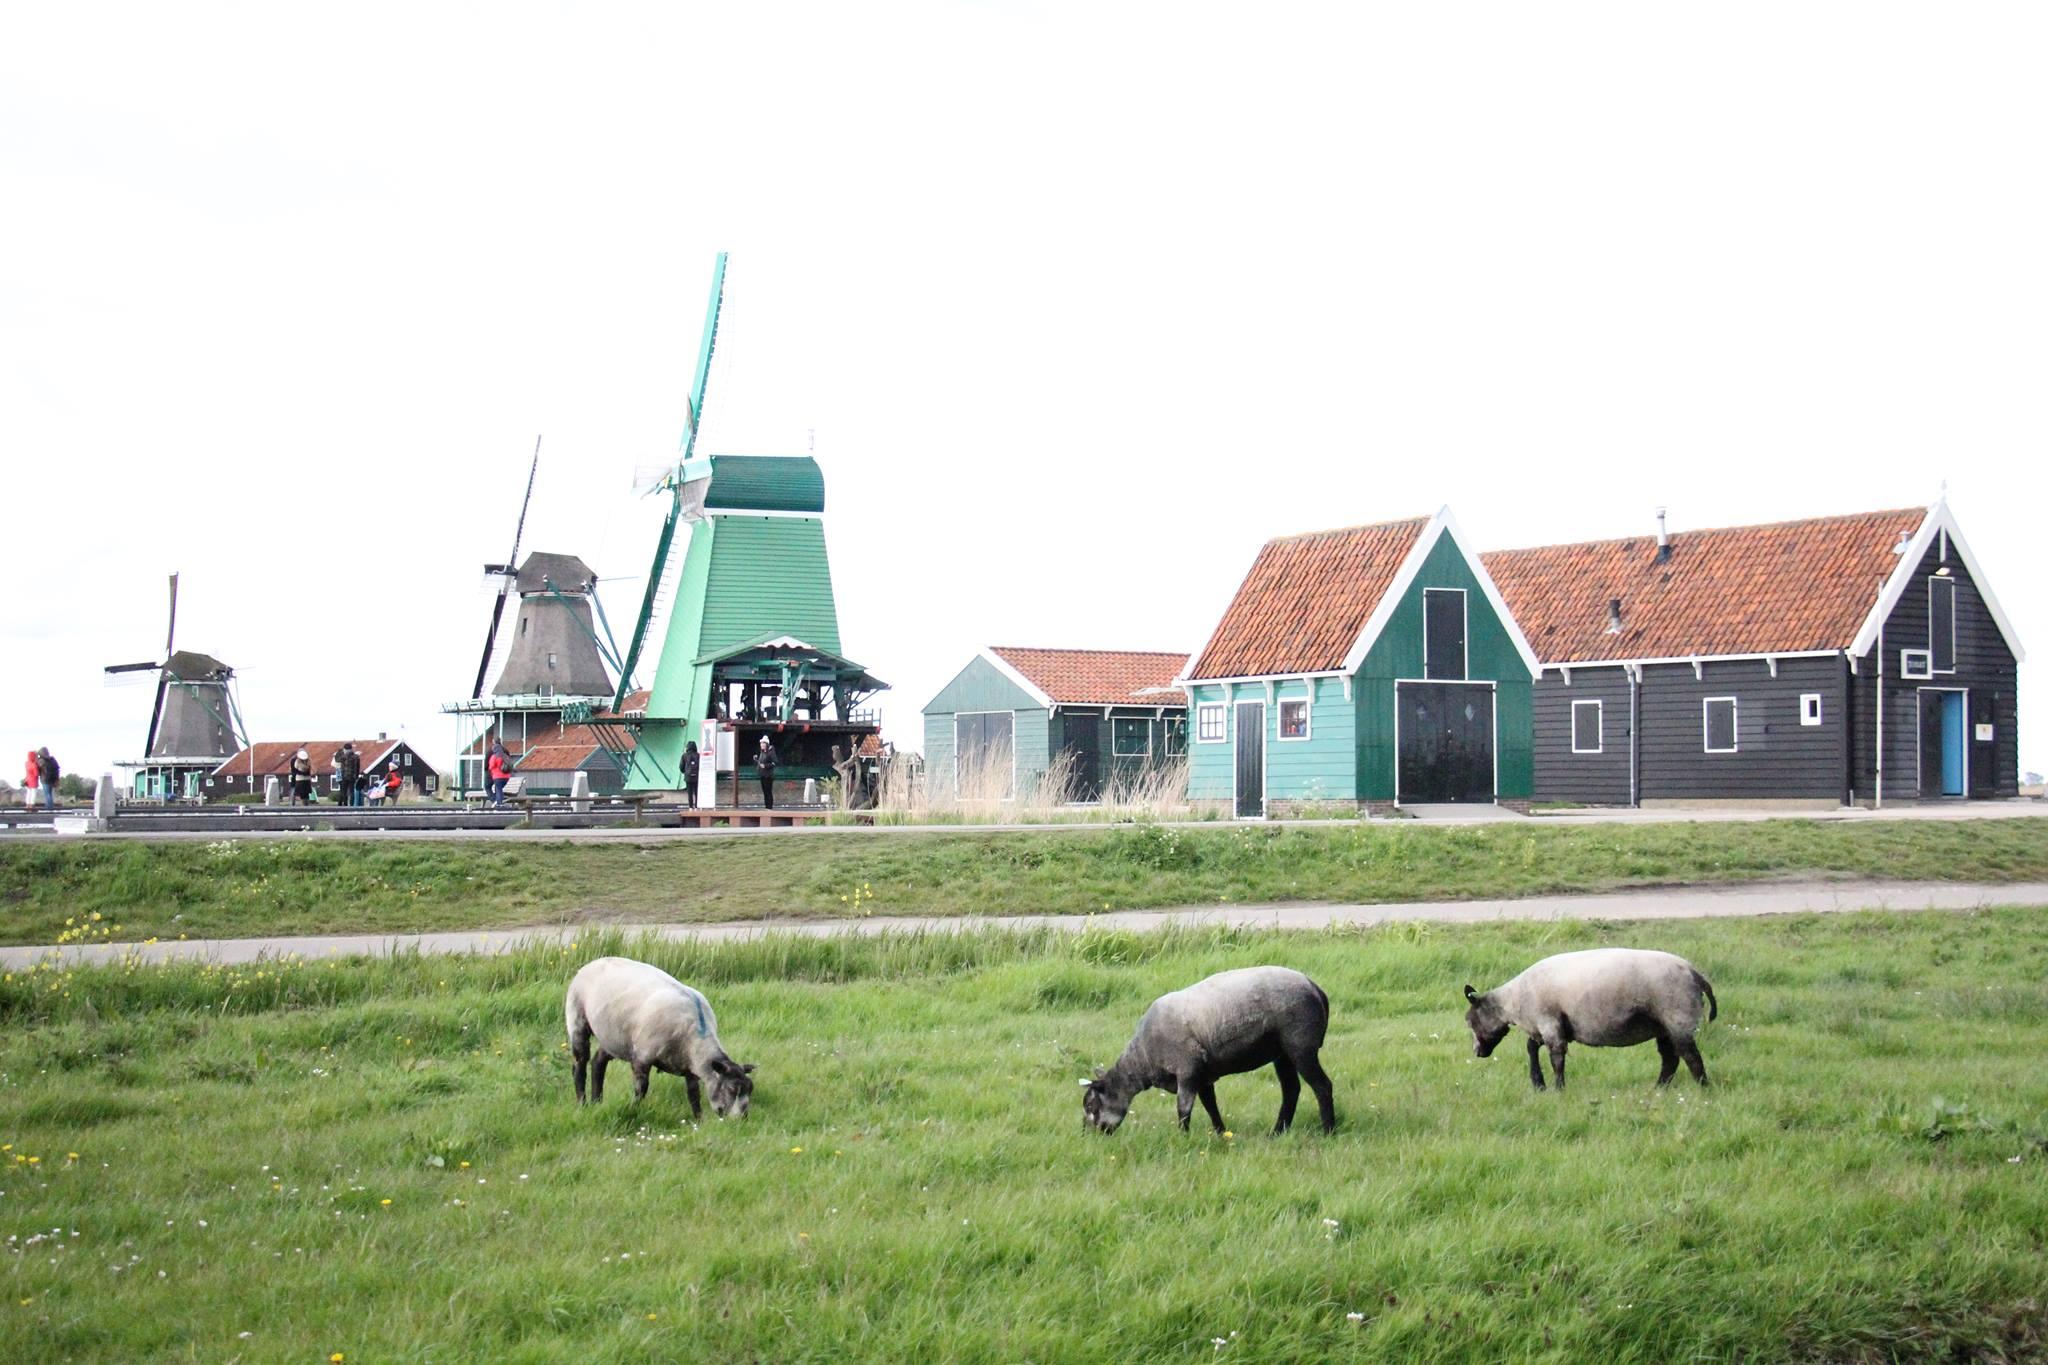 Zaanse Schans - a Windmill Village